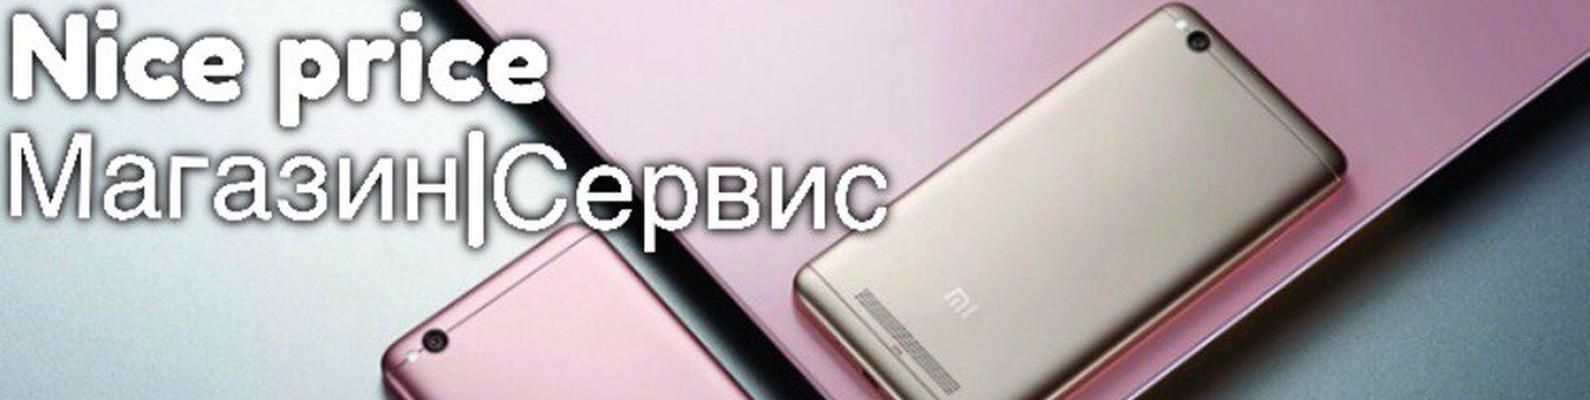 a919ac22 NicePrice67.ru Рославль |Магазин техники|Сервис| | ВКонтакте